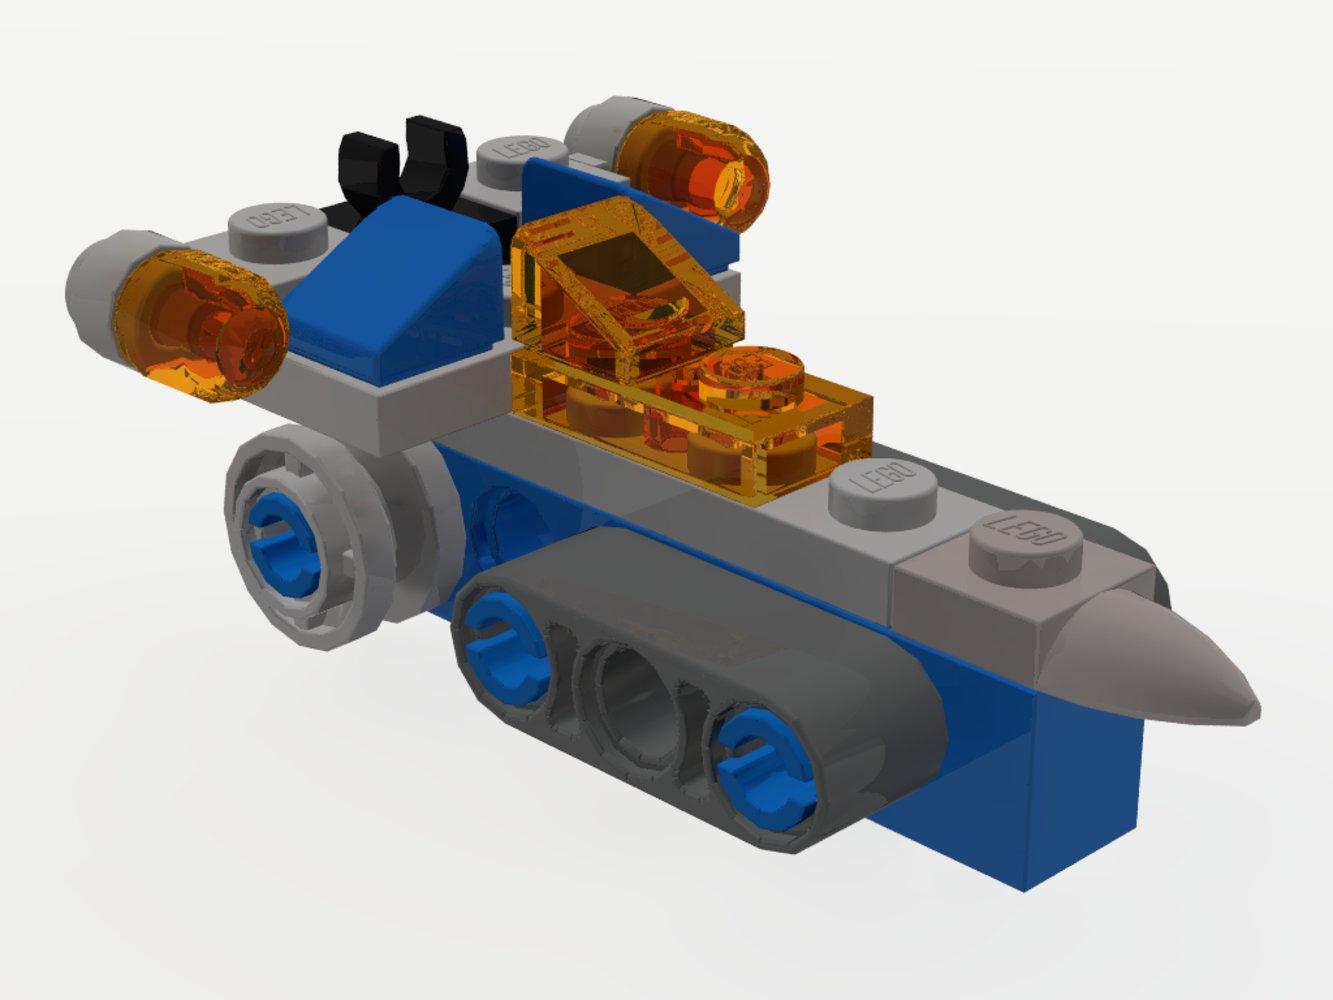 Micro Rumble Blade